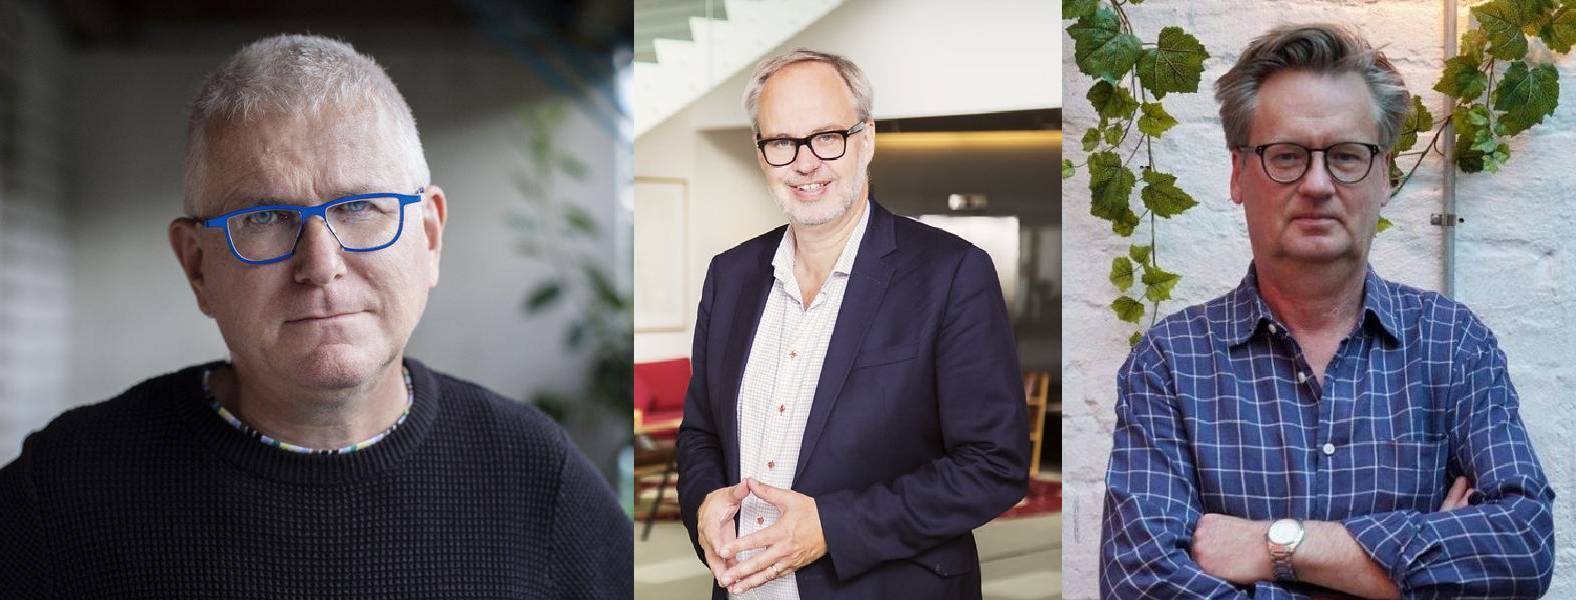 Per Wirtén, Andreas Miller and Alf Håkan Bengtsson